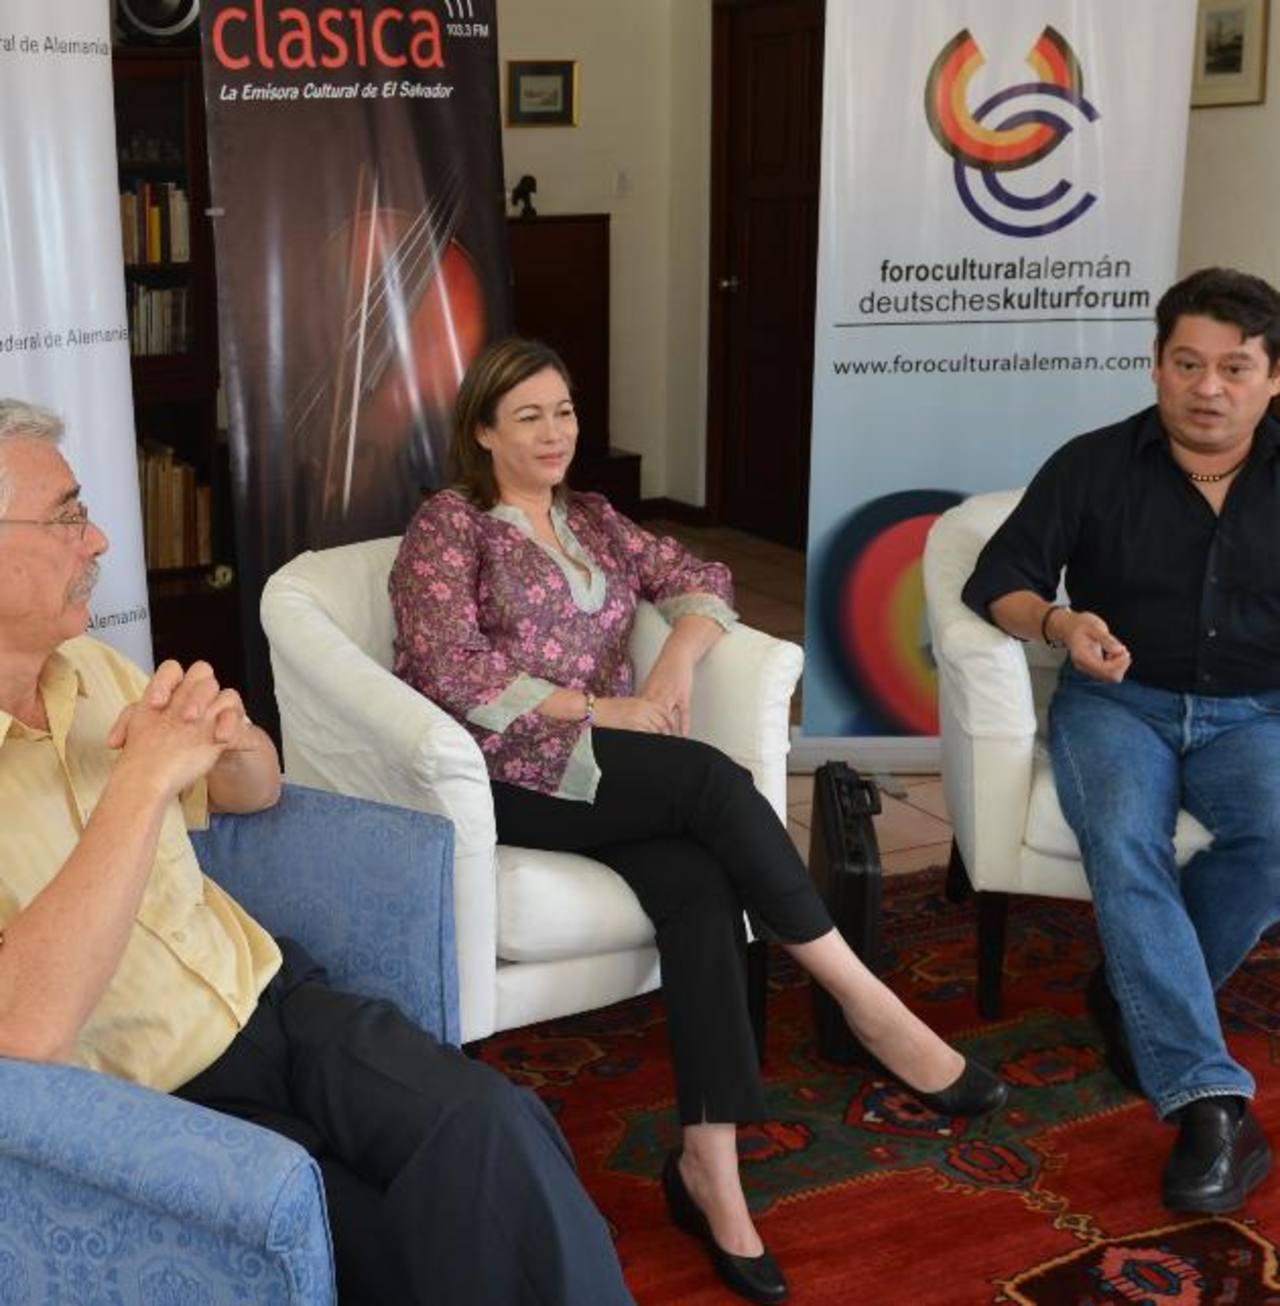 Gerhard Wiech, Elizabeth Trabanino y Juan Fernando Villafuerte. Foto EDH / douglas urquilla